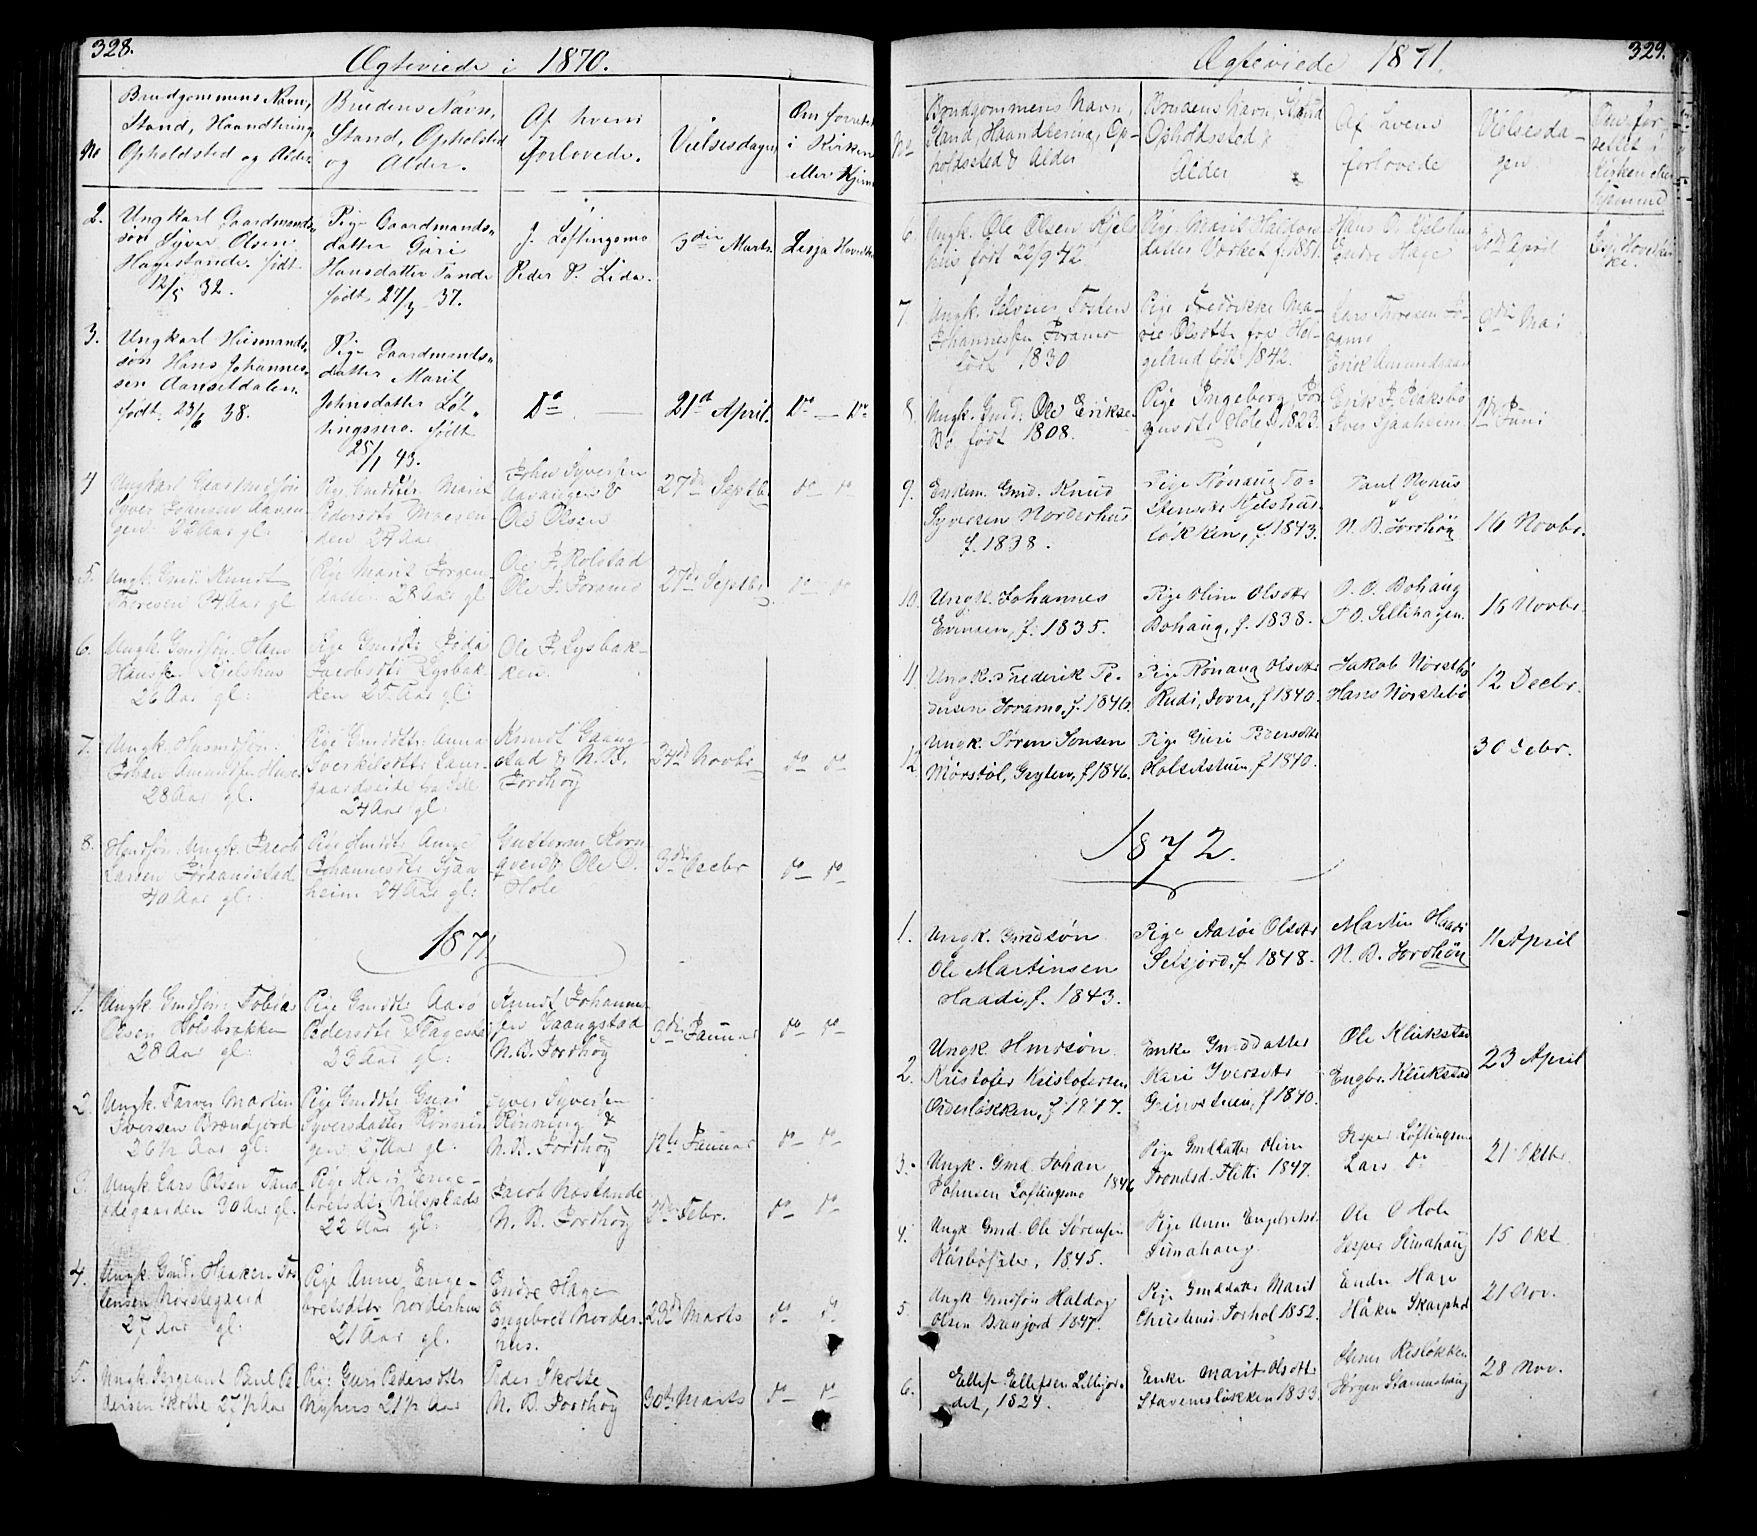 SAH, Lesja prestekontor, Klokkerbok nr. 5, 1850-1894, s. 328-329